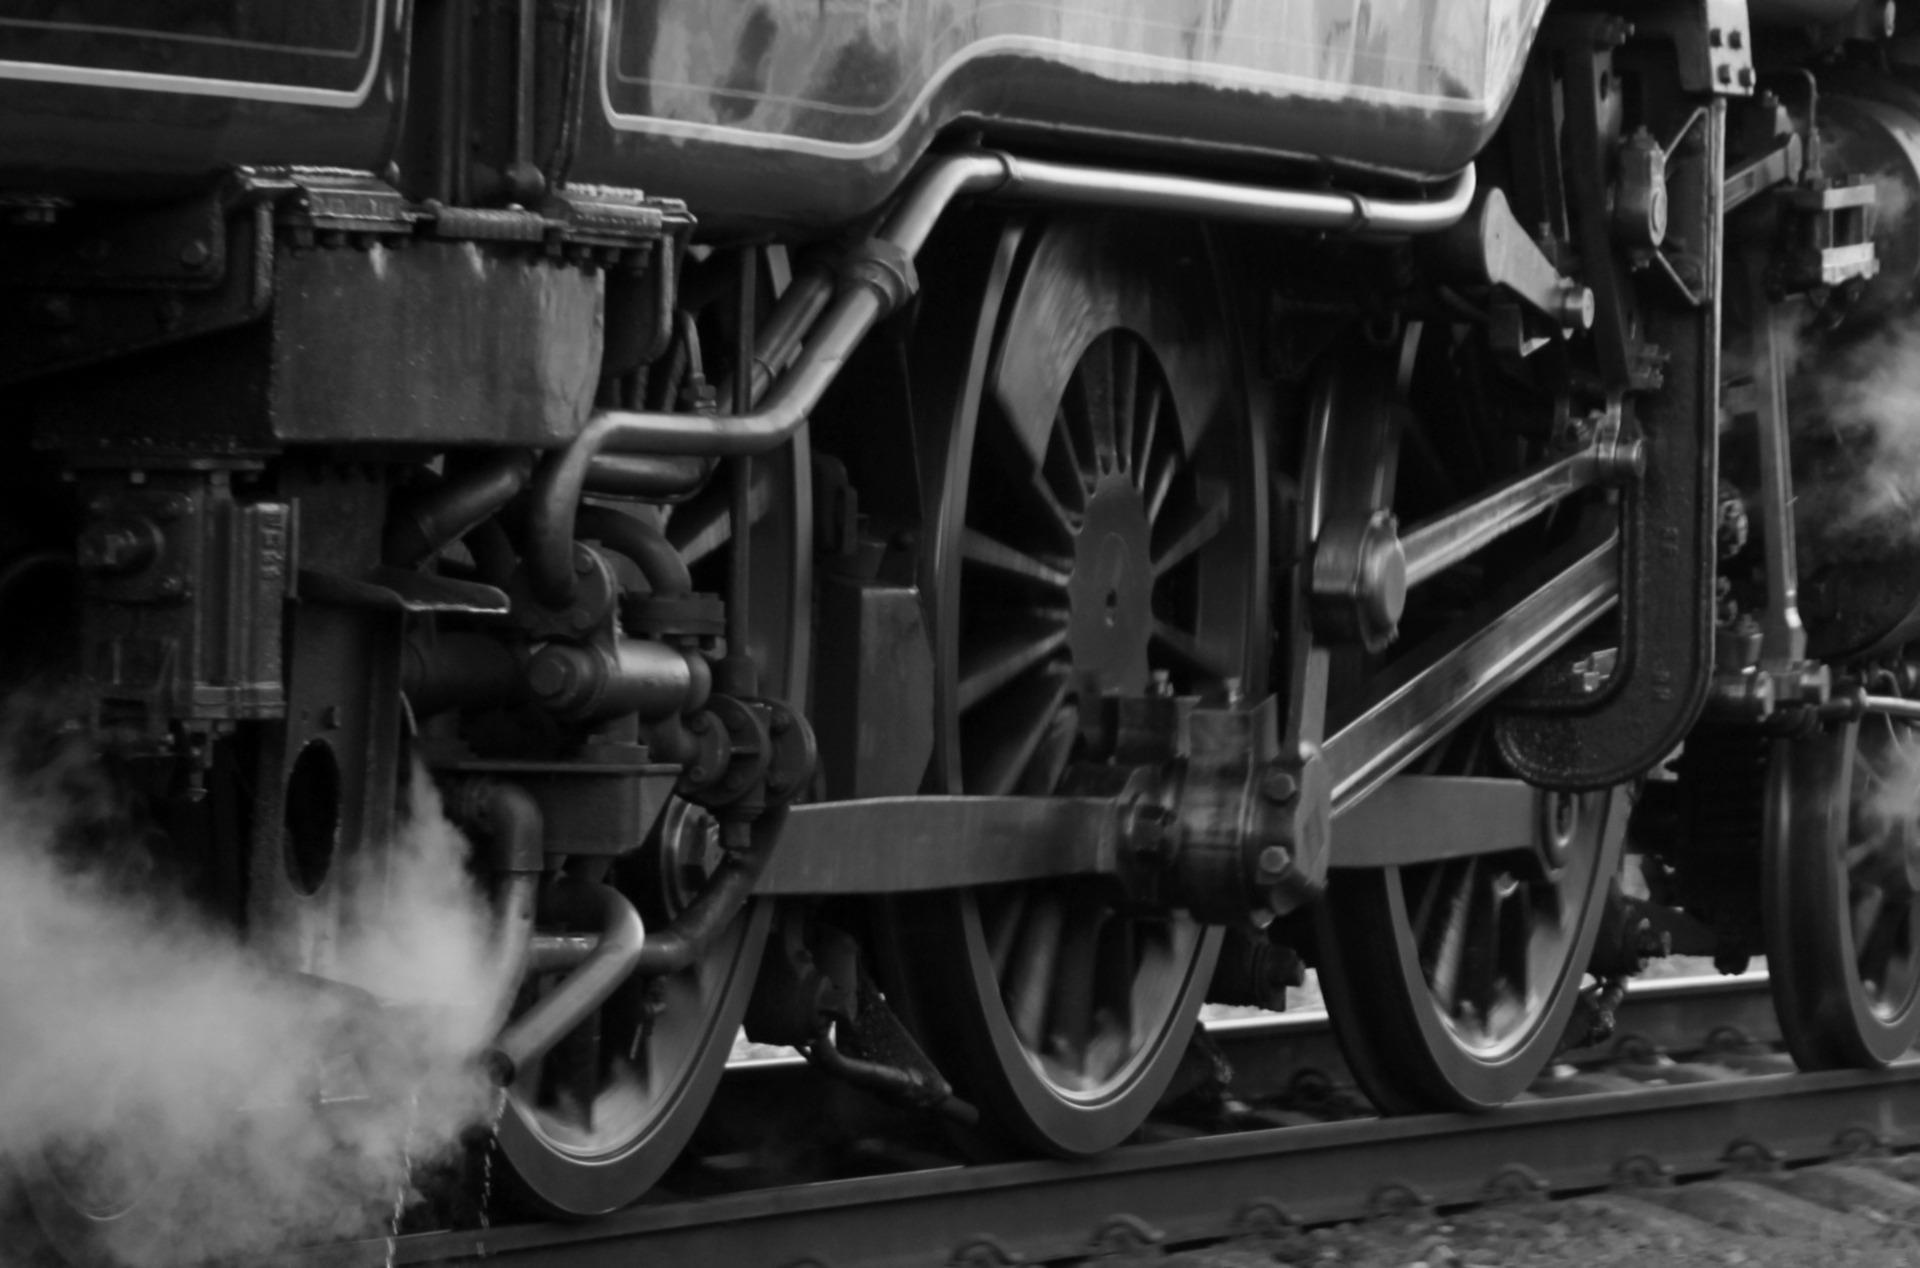 train-19640 (1).jpg